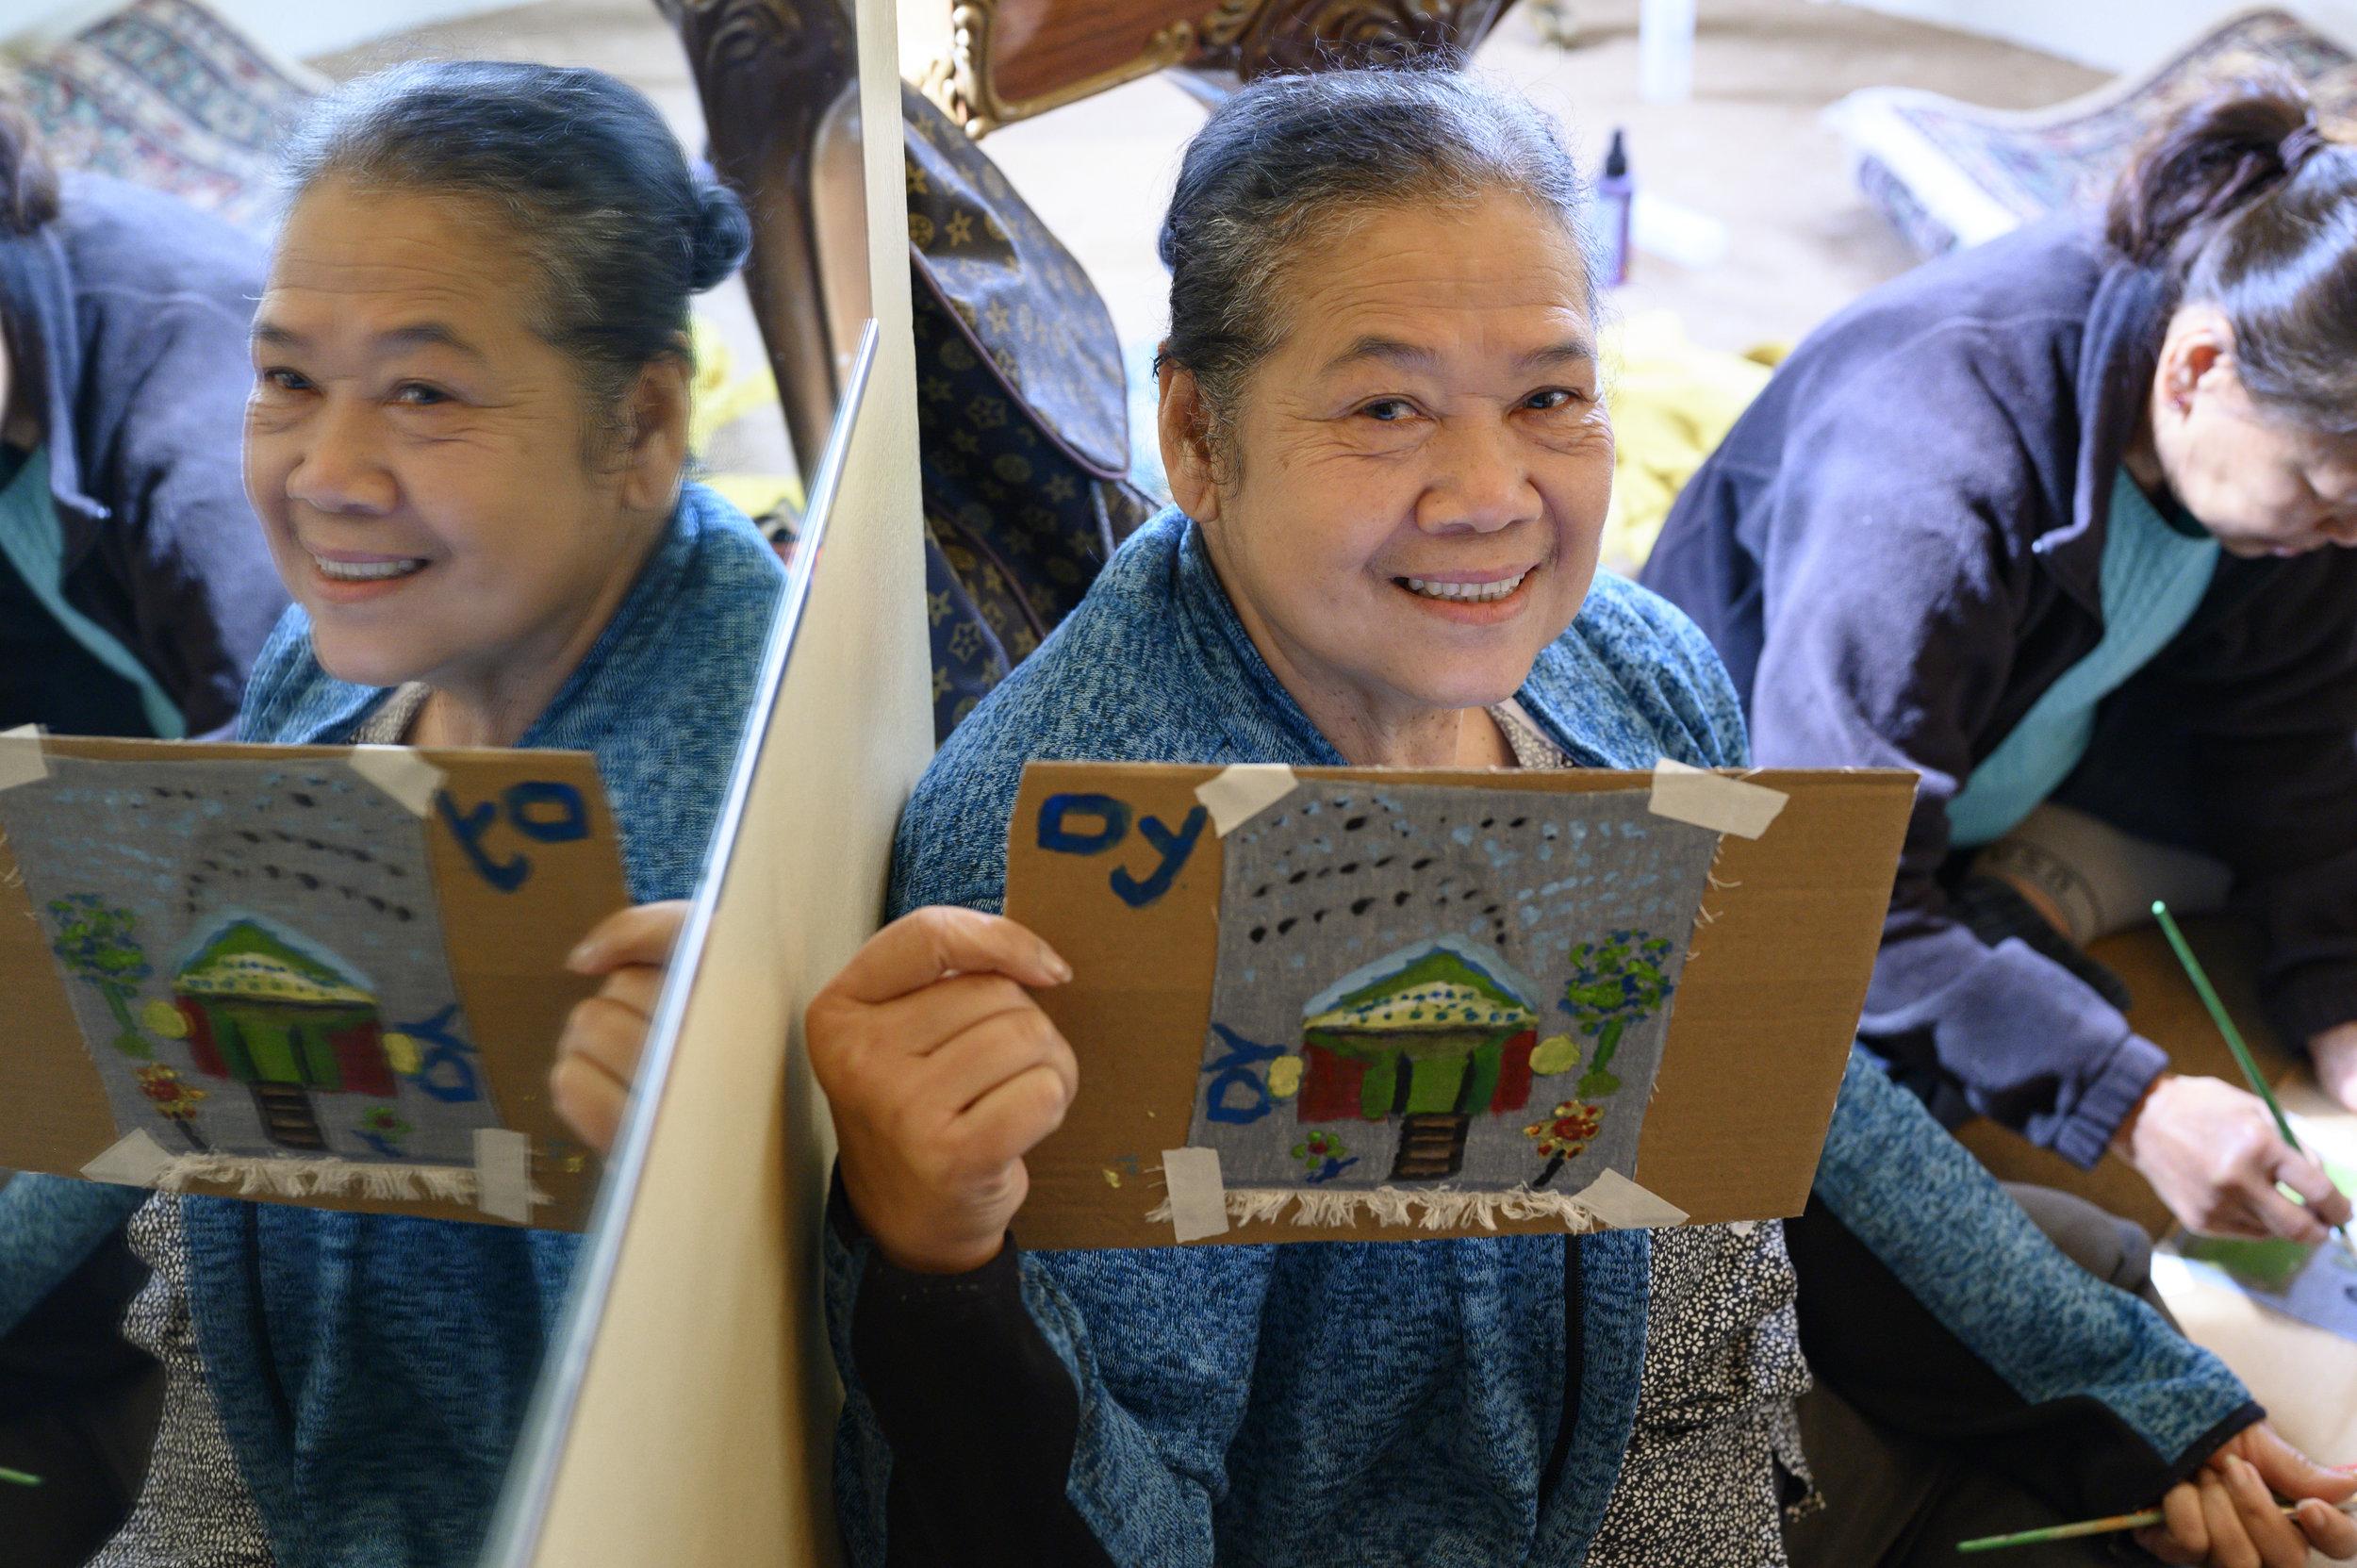 fabric-painting-artogether-women-5.jpg